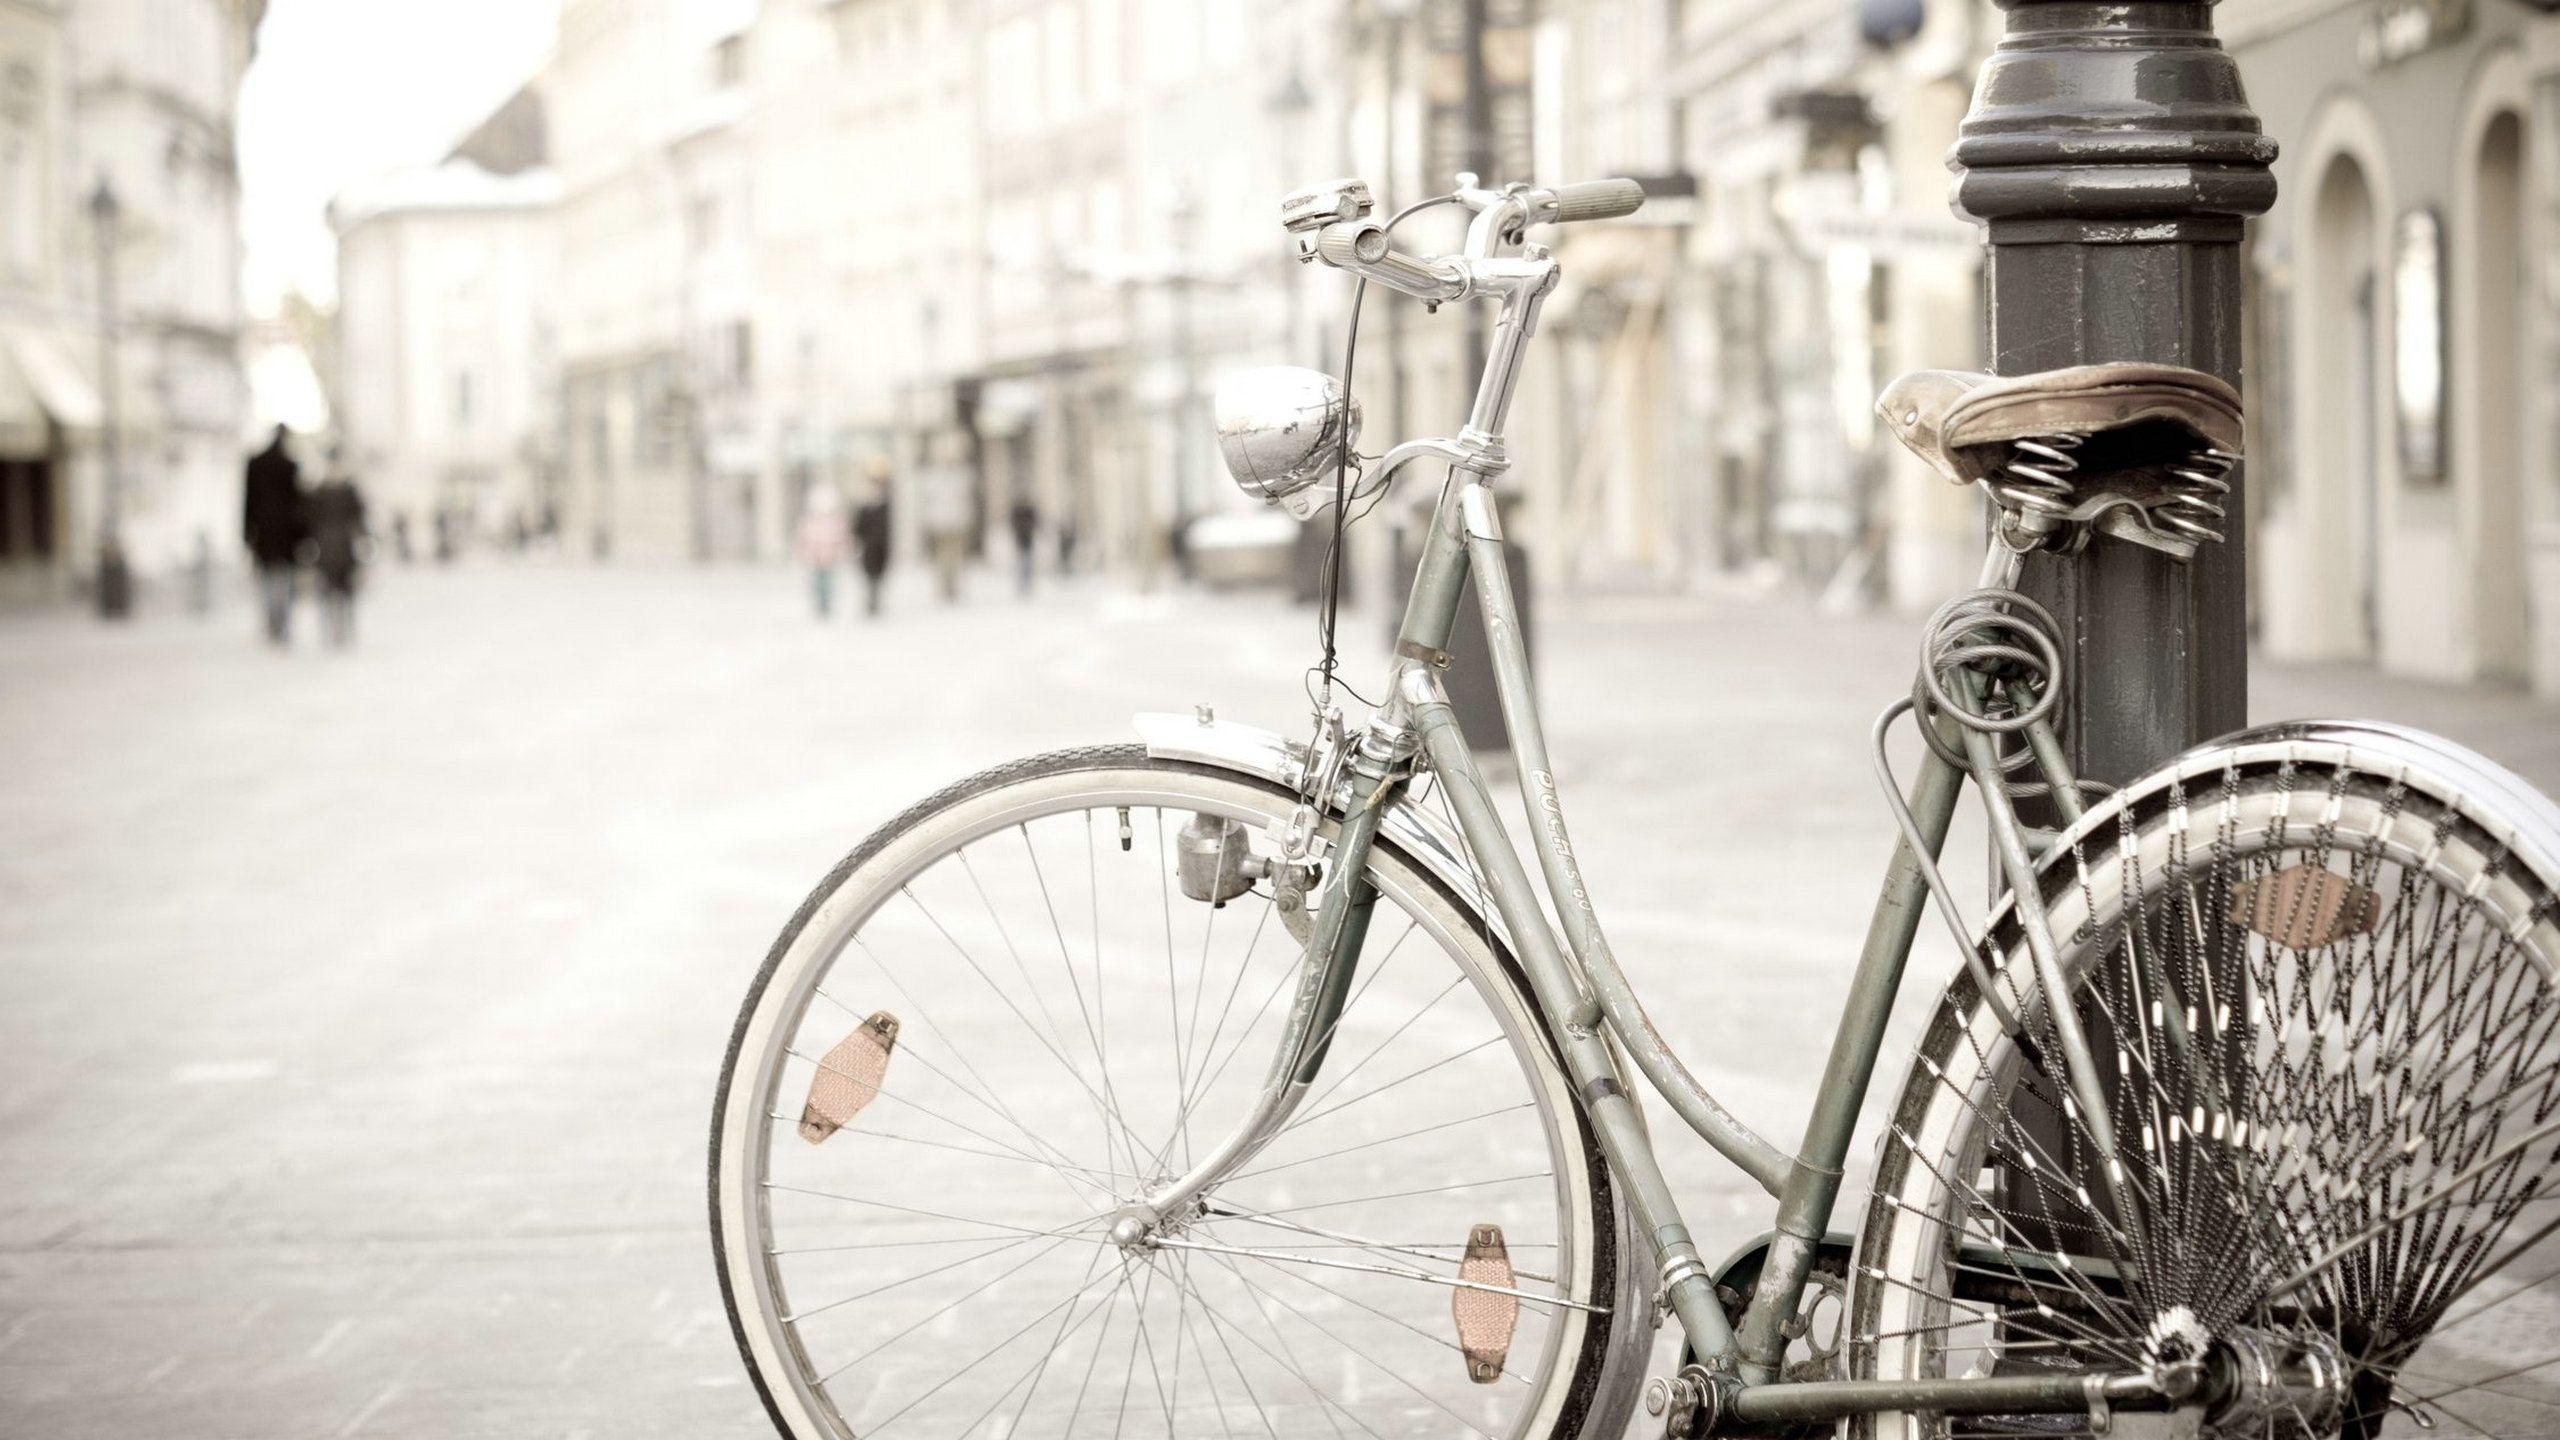 Vintage Bicycle Mood Hd Wallpaper 2560x1440PX